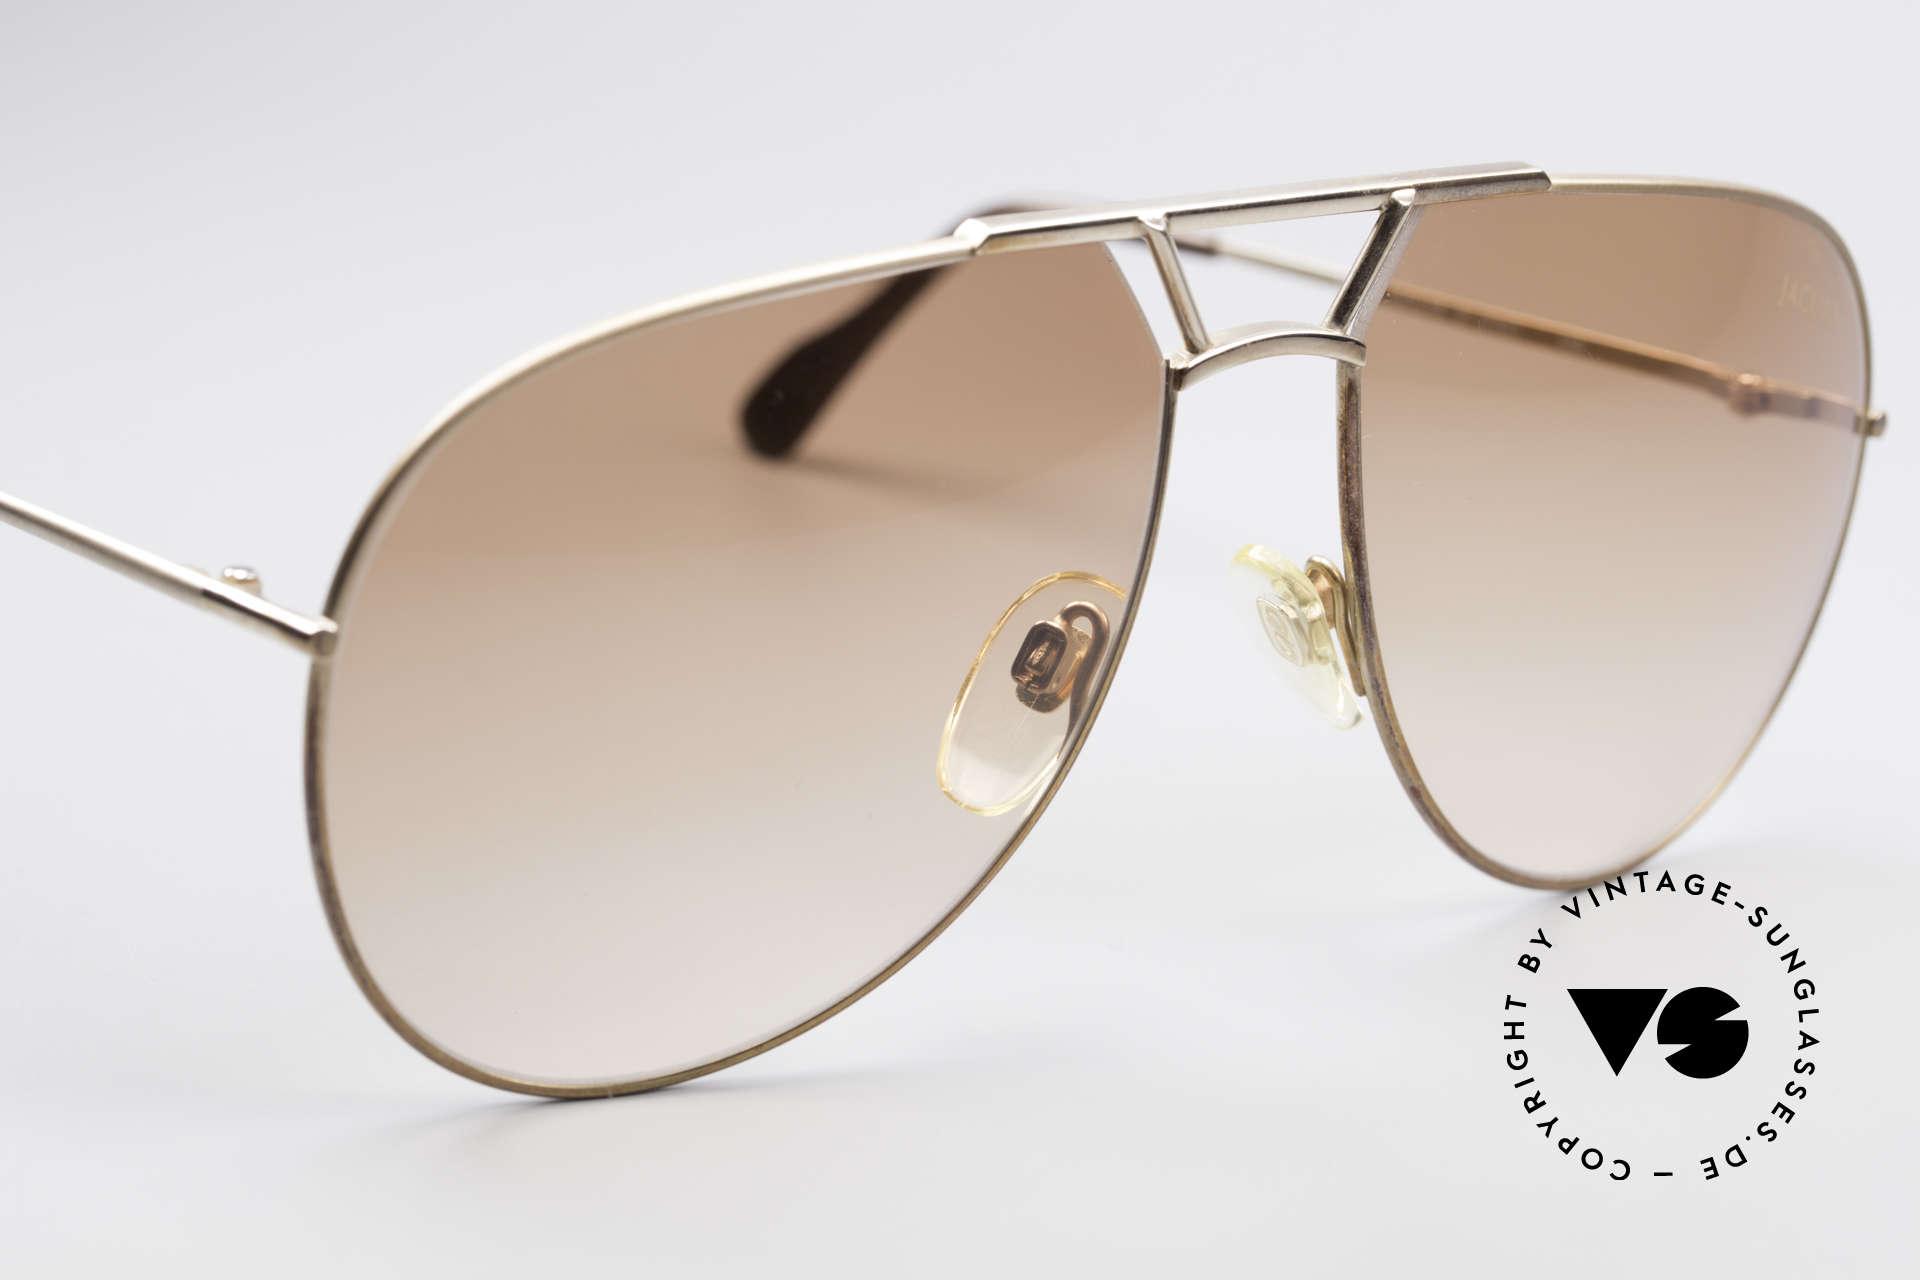 Jaguar 795 Vintage Men's Sunglasses, unworn (like all our vintage men's sunglasses), Made for Men